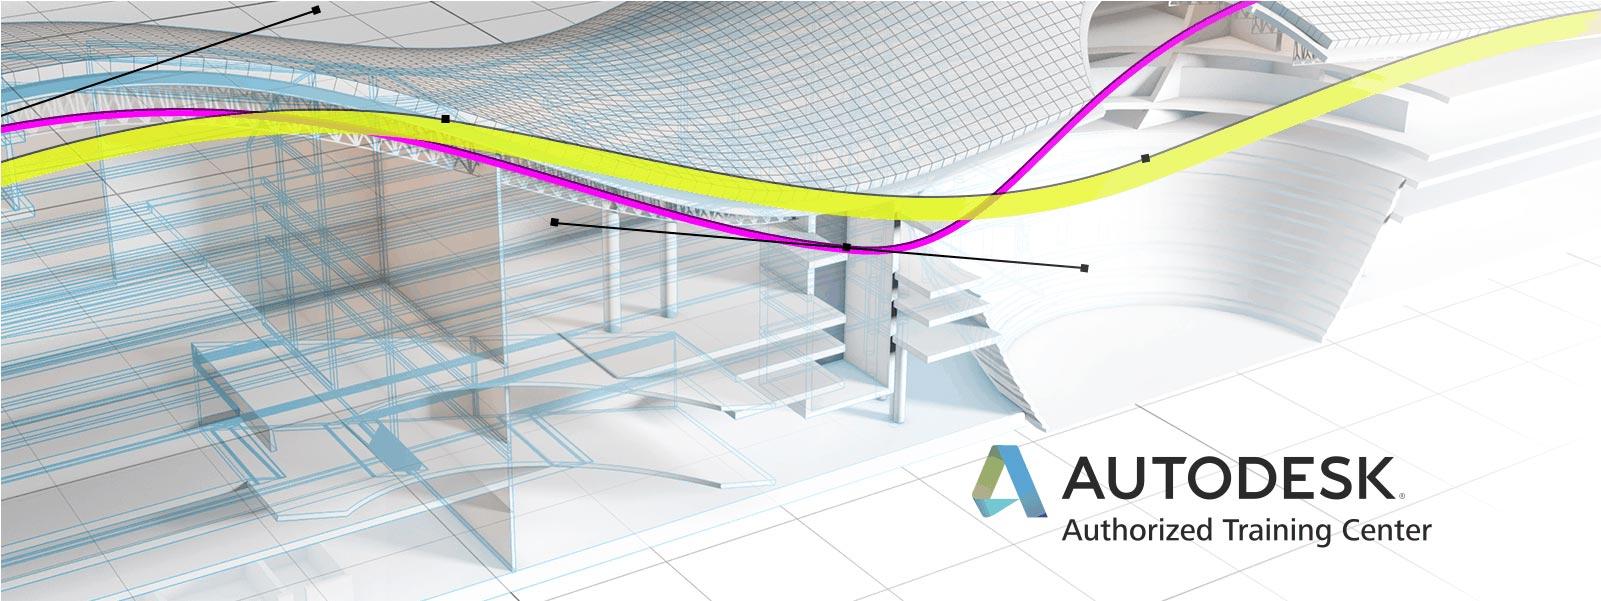 Autodesk ATC